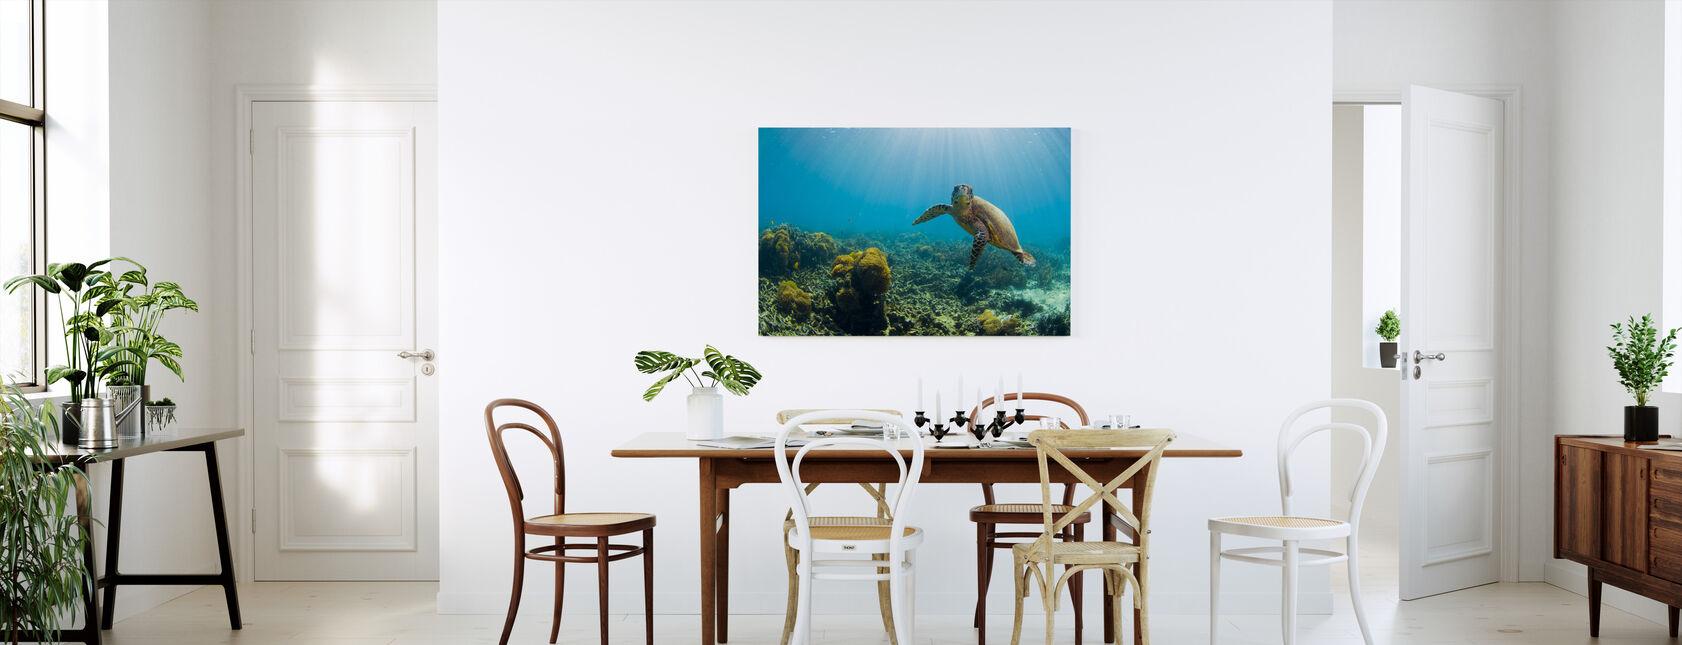 Charming Turtle - Canvas print - Kitchen